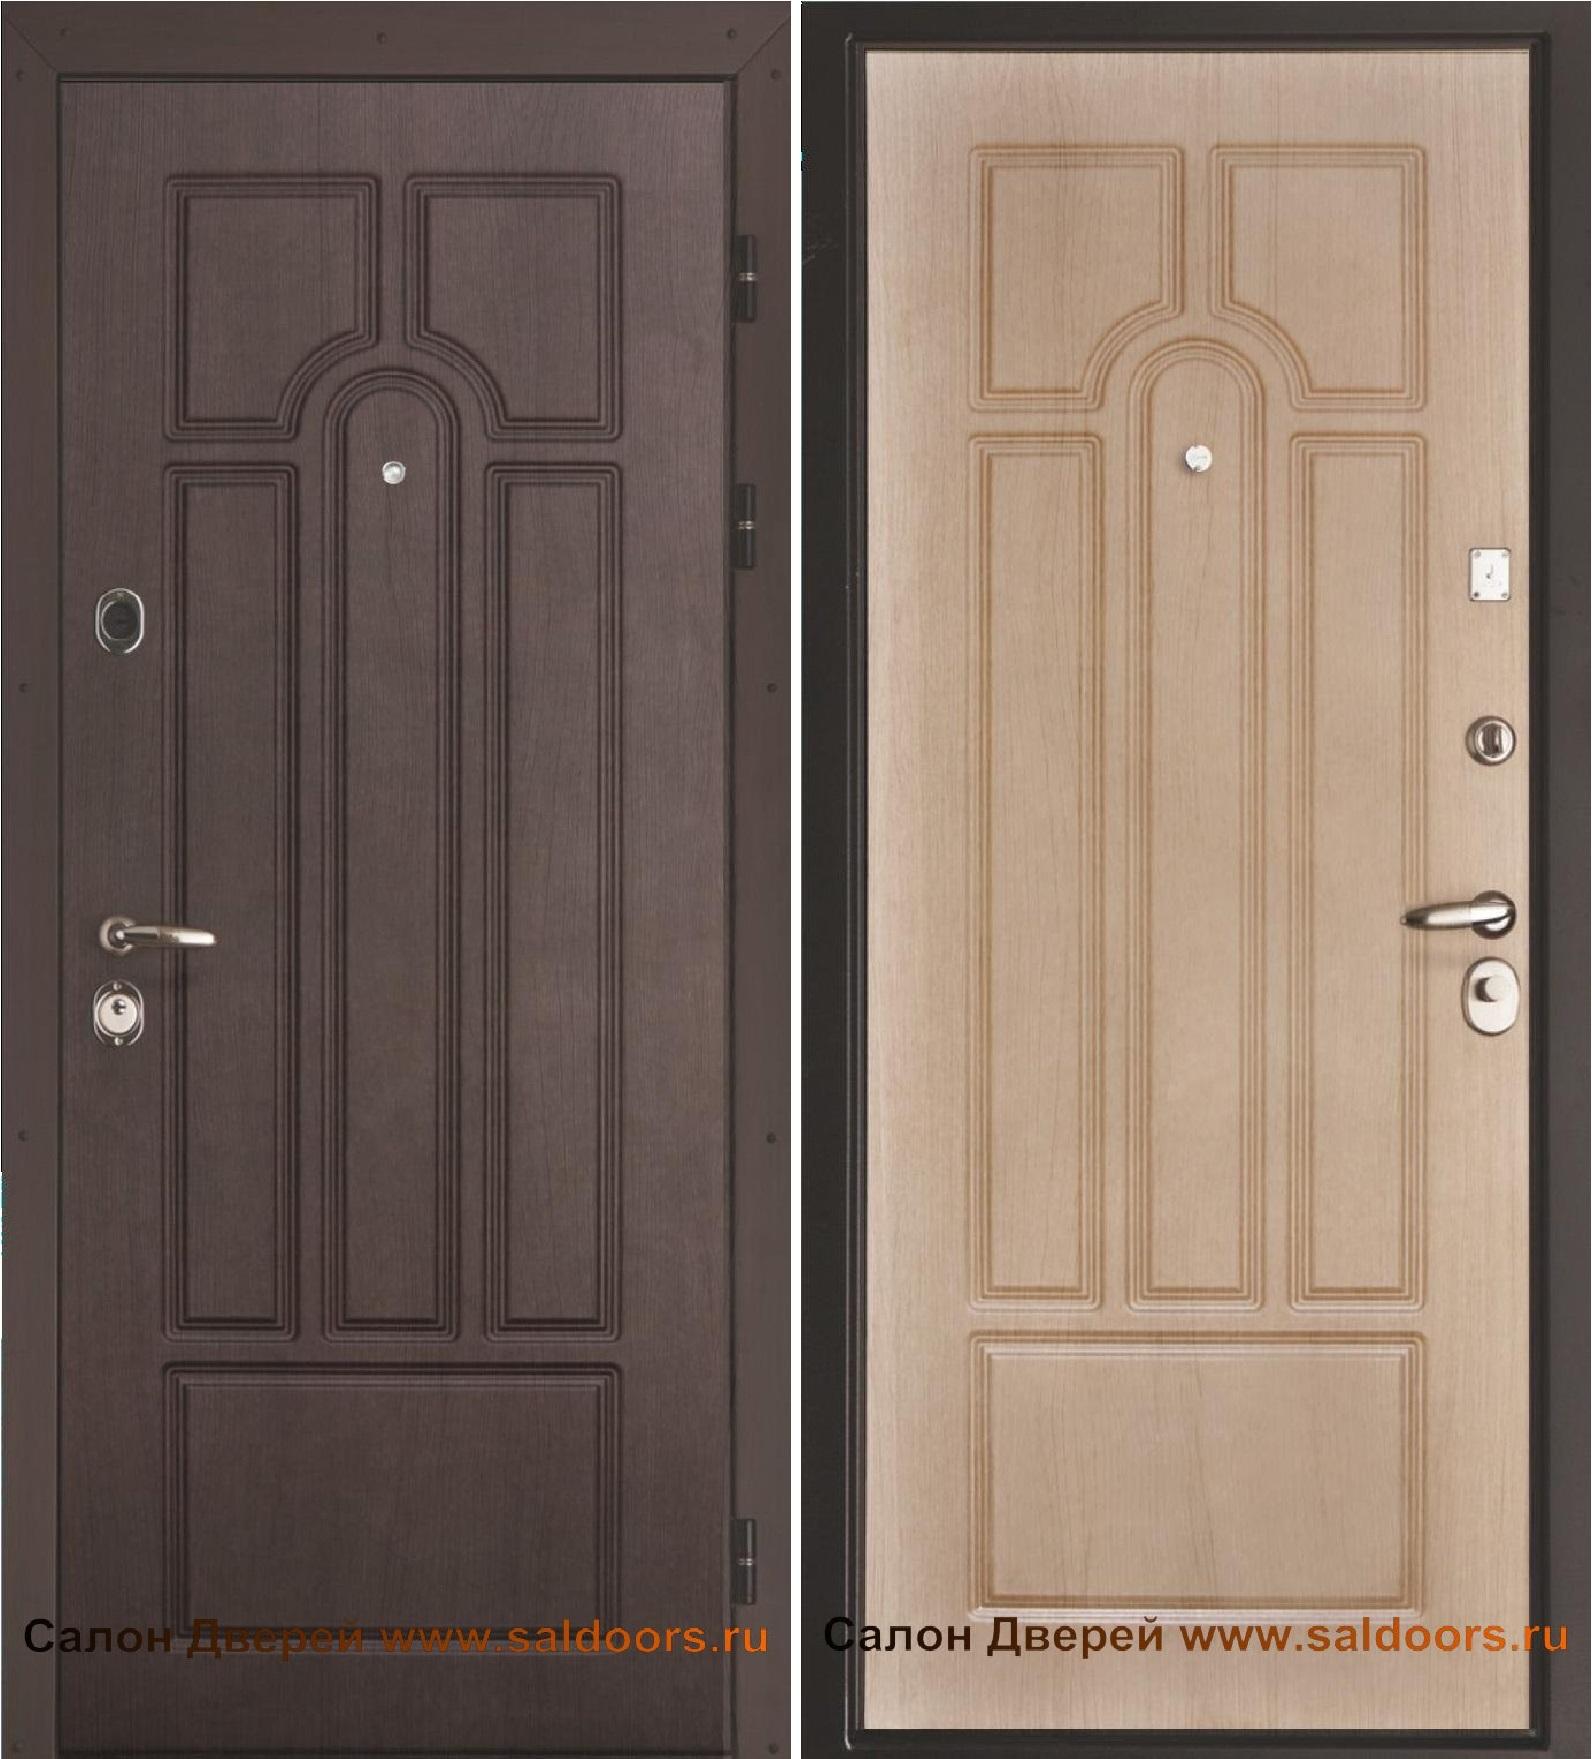 металлические двери зеленоград производство